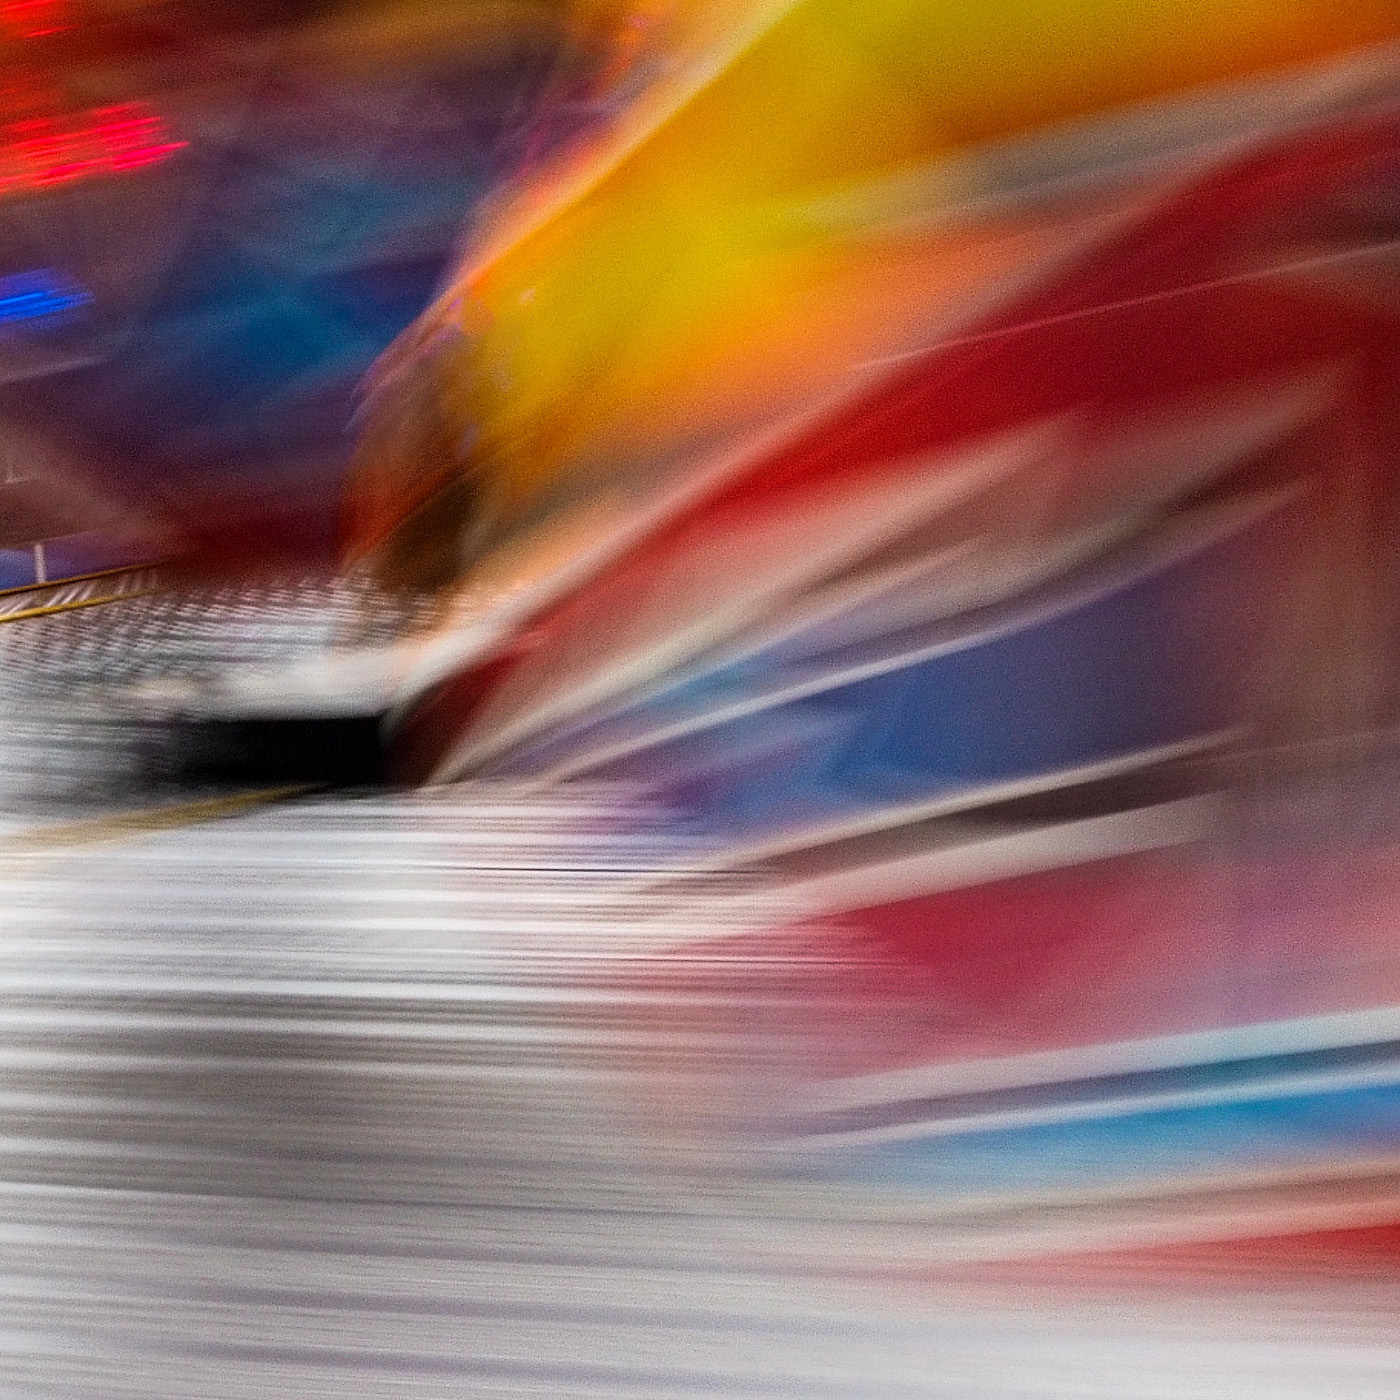 Farbenspiele #3 | © wolfgang röser | worobo